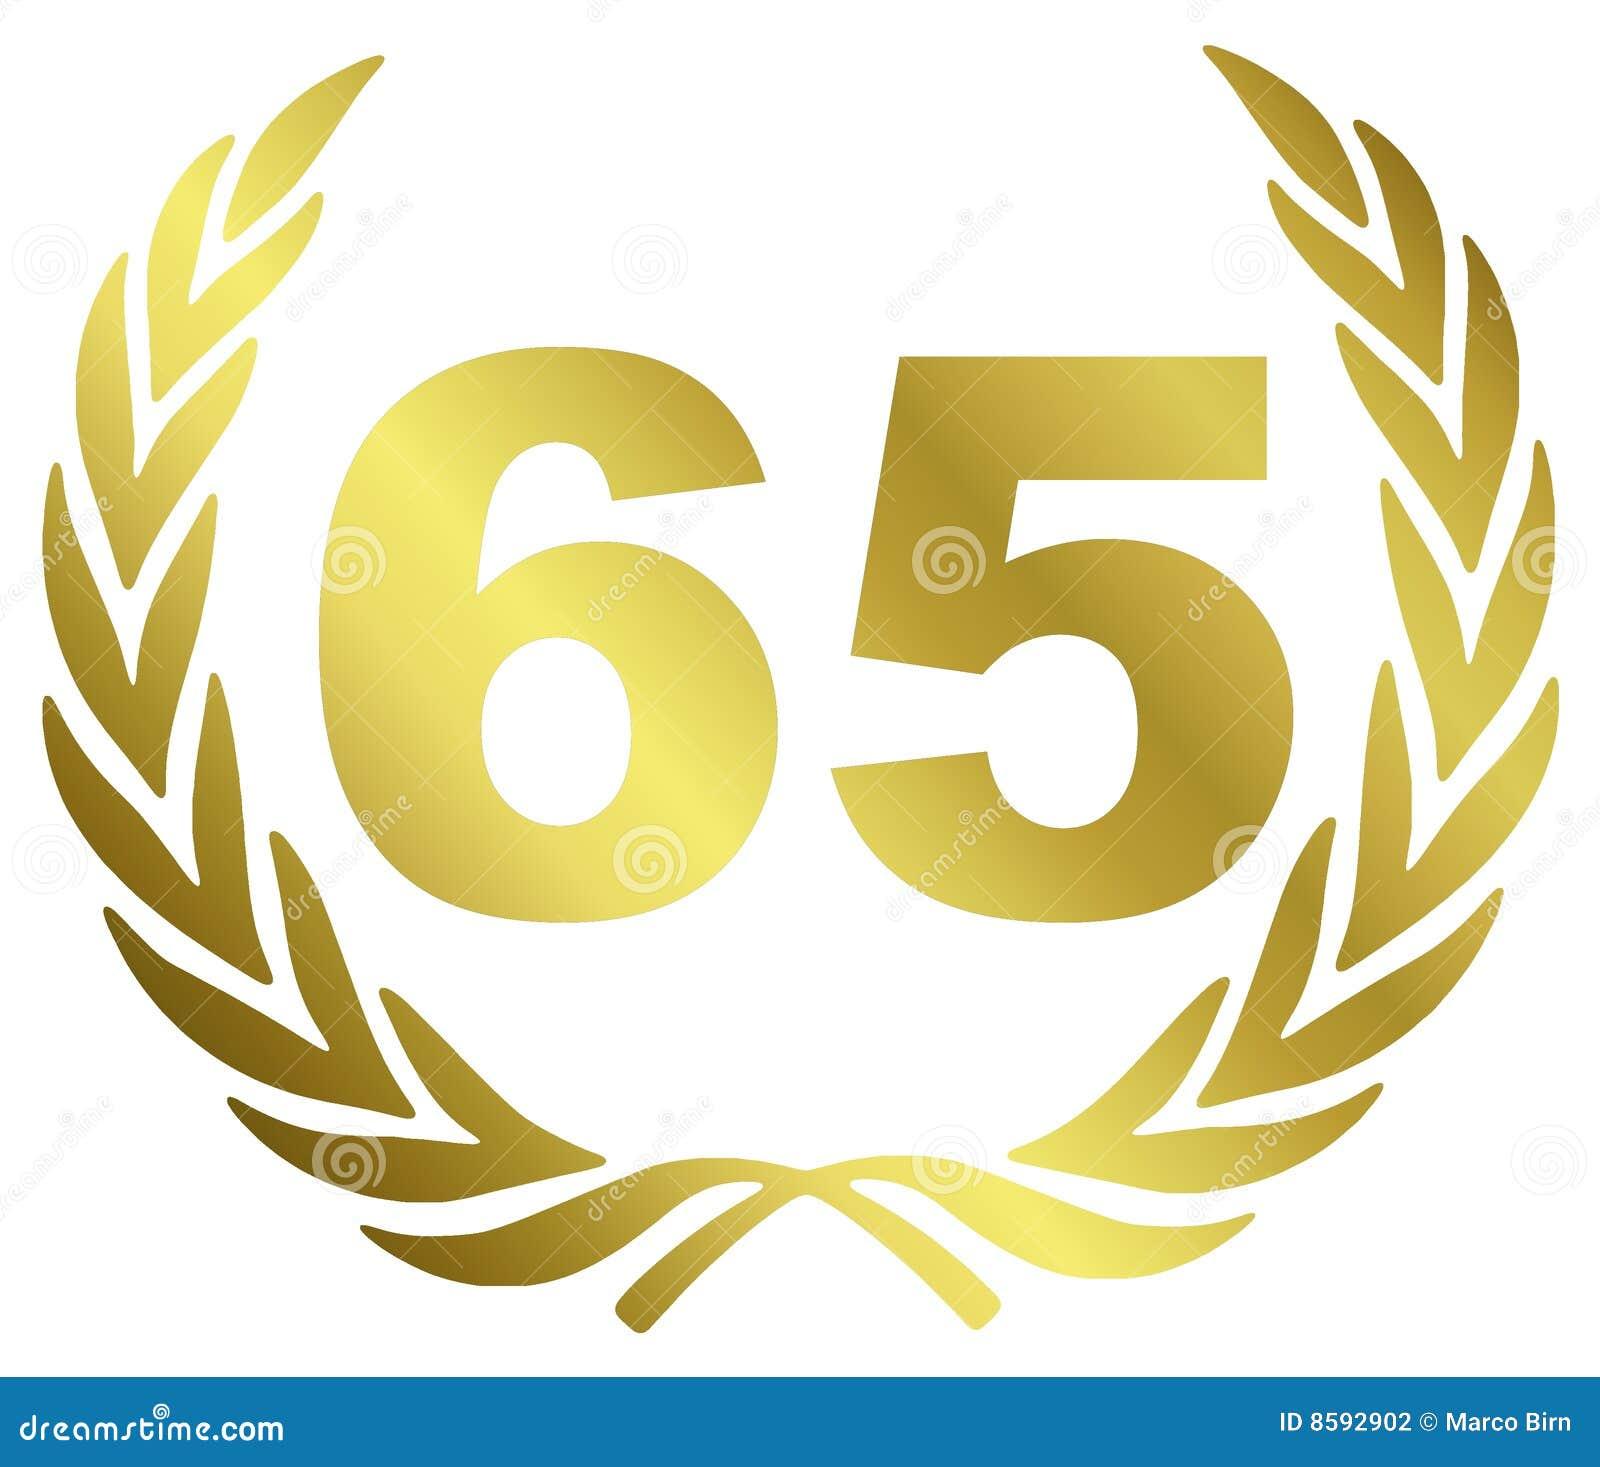 65 Anniversary vector illustration